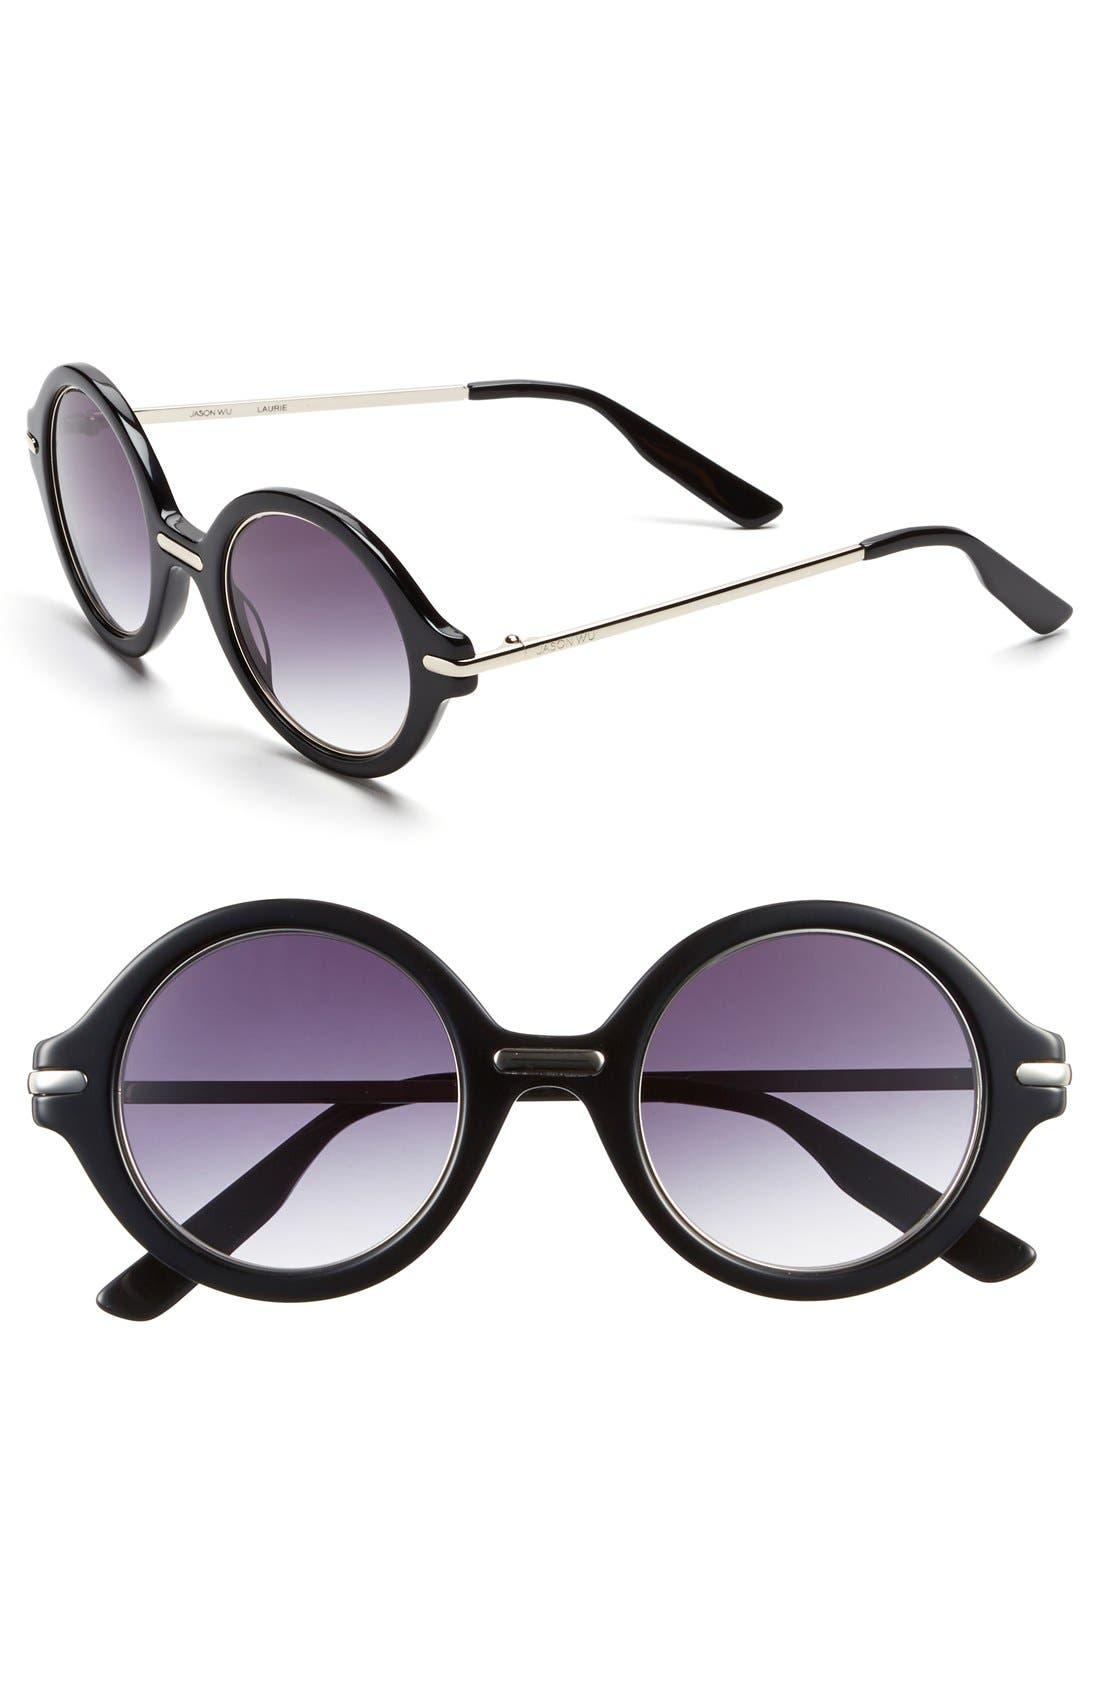 Jason Wu 'Laurie' 46mm Sunglasses,                             Main thumbnail 1, color,                             001